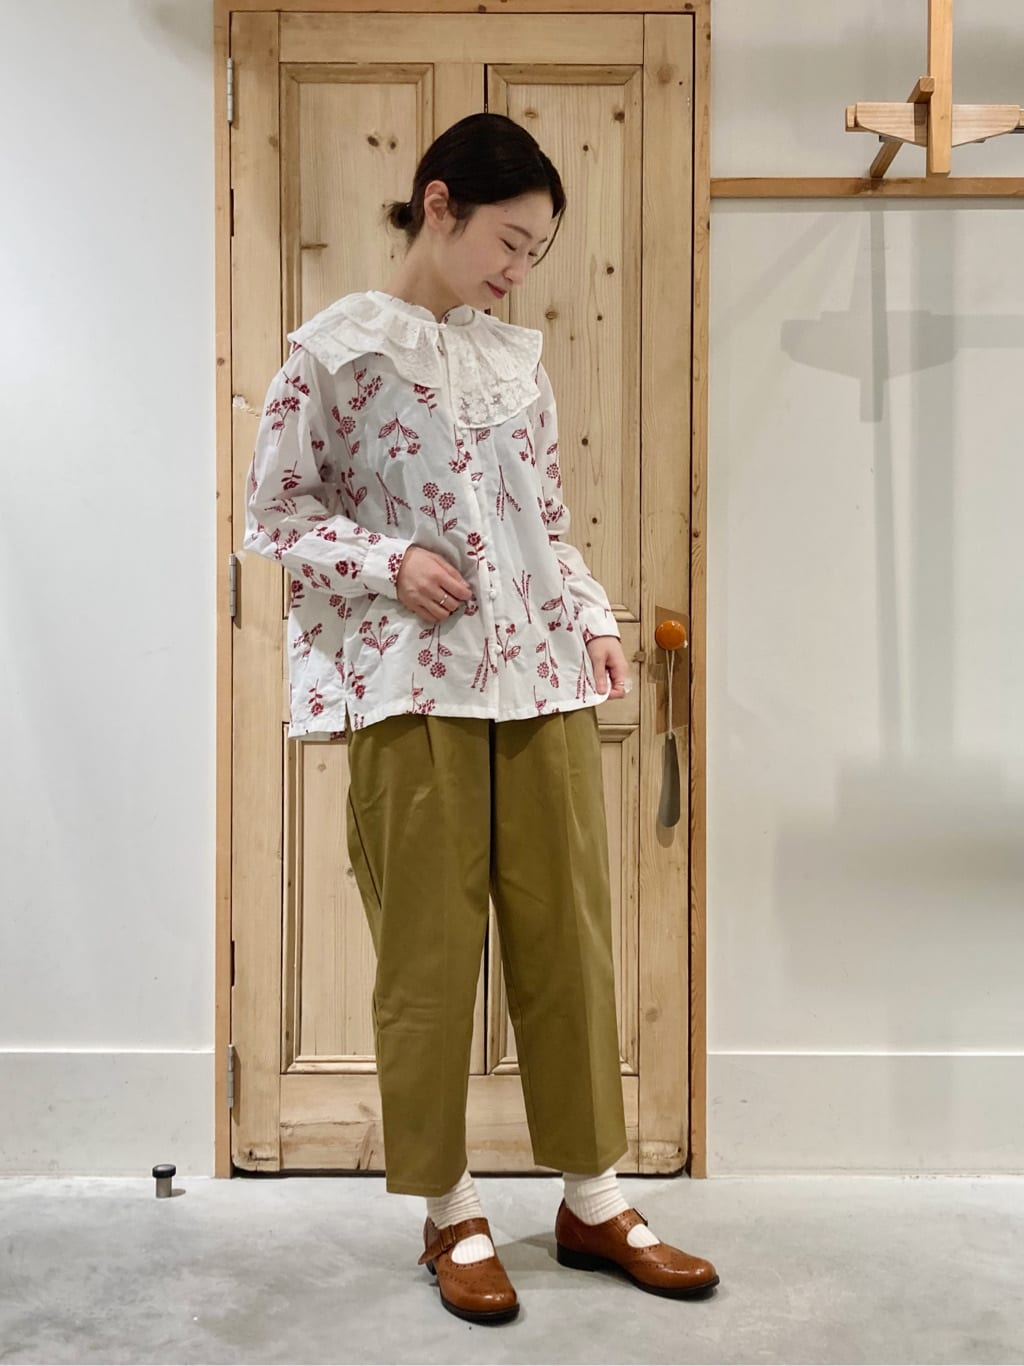 Malle chambre de charme 調布パルコ 身長:162cm 2021.09.14